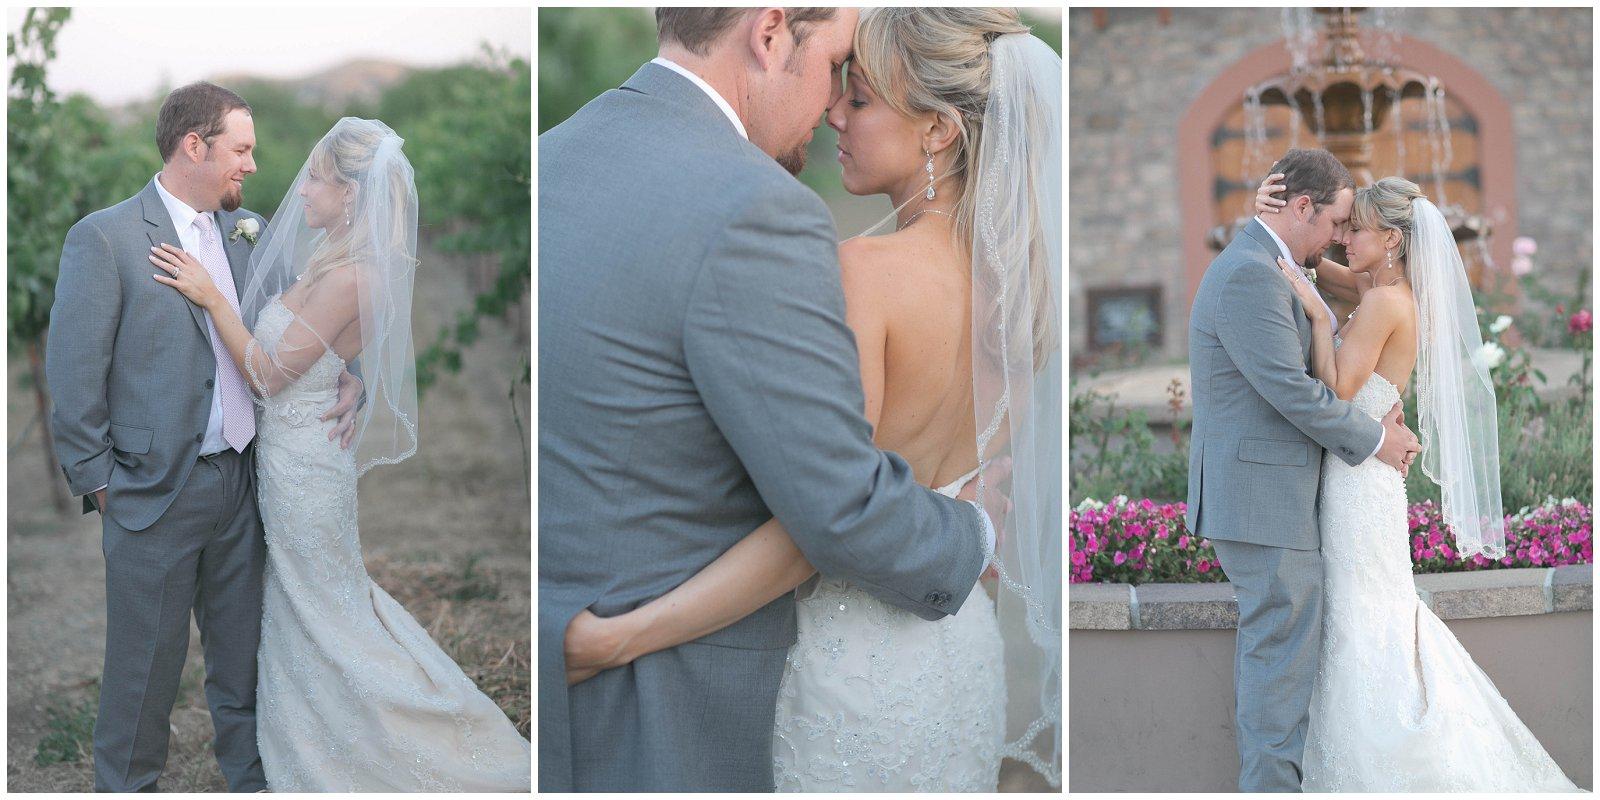 San-Francisco-Bay-Area-Wedding-Photography-Casa-Real-9.jpg